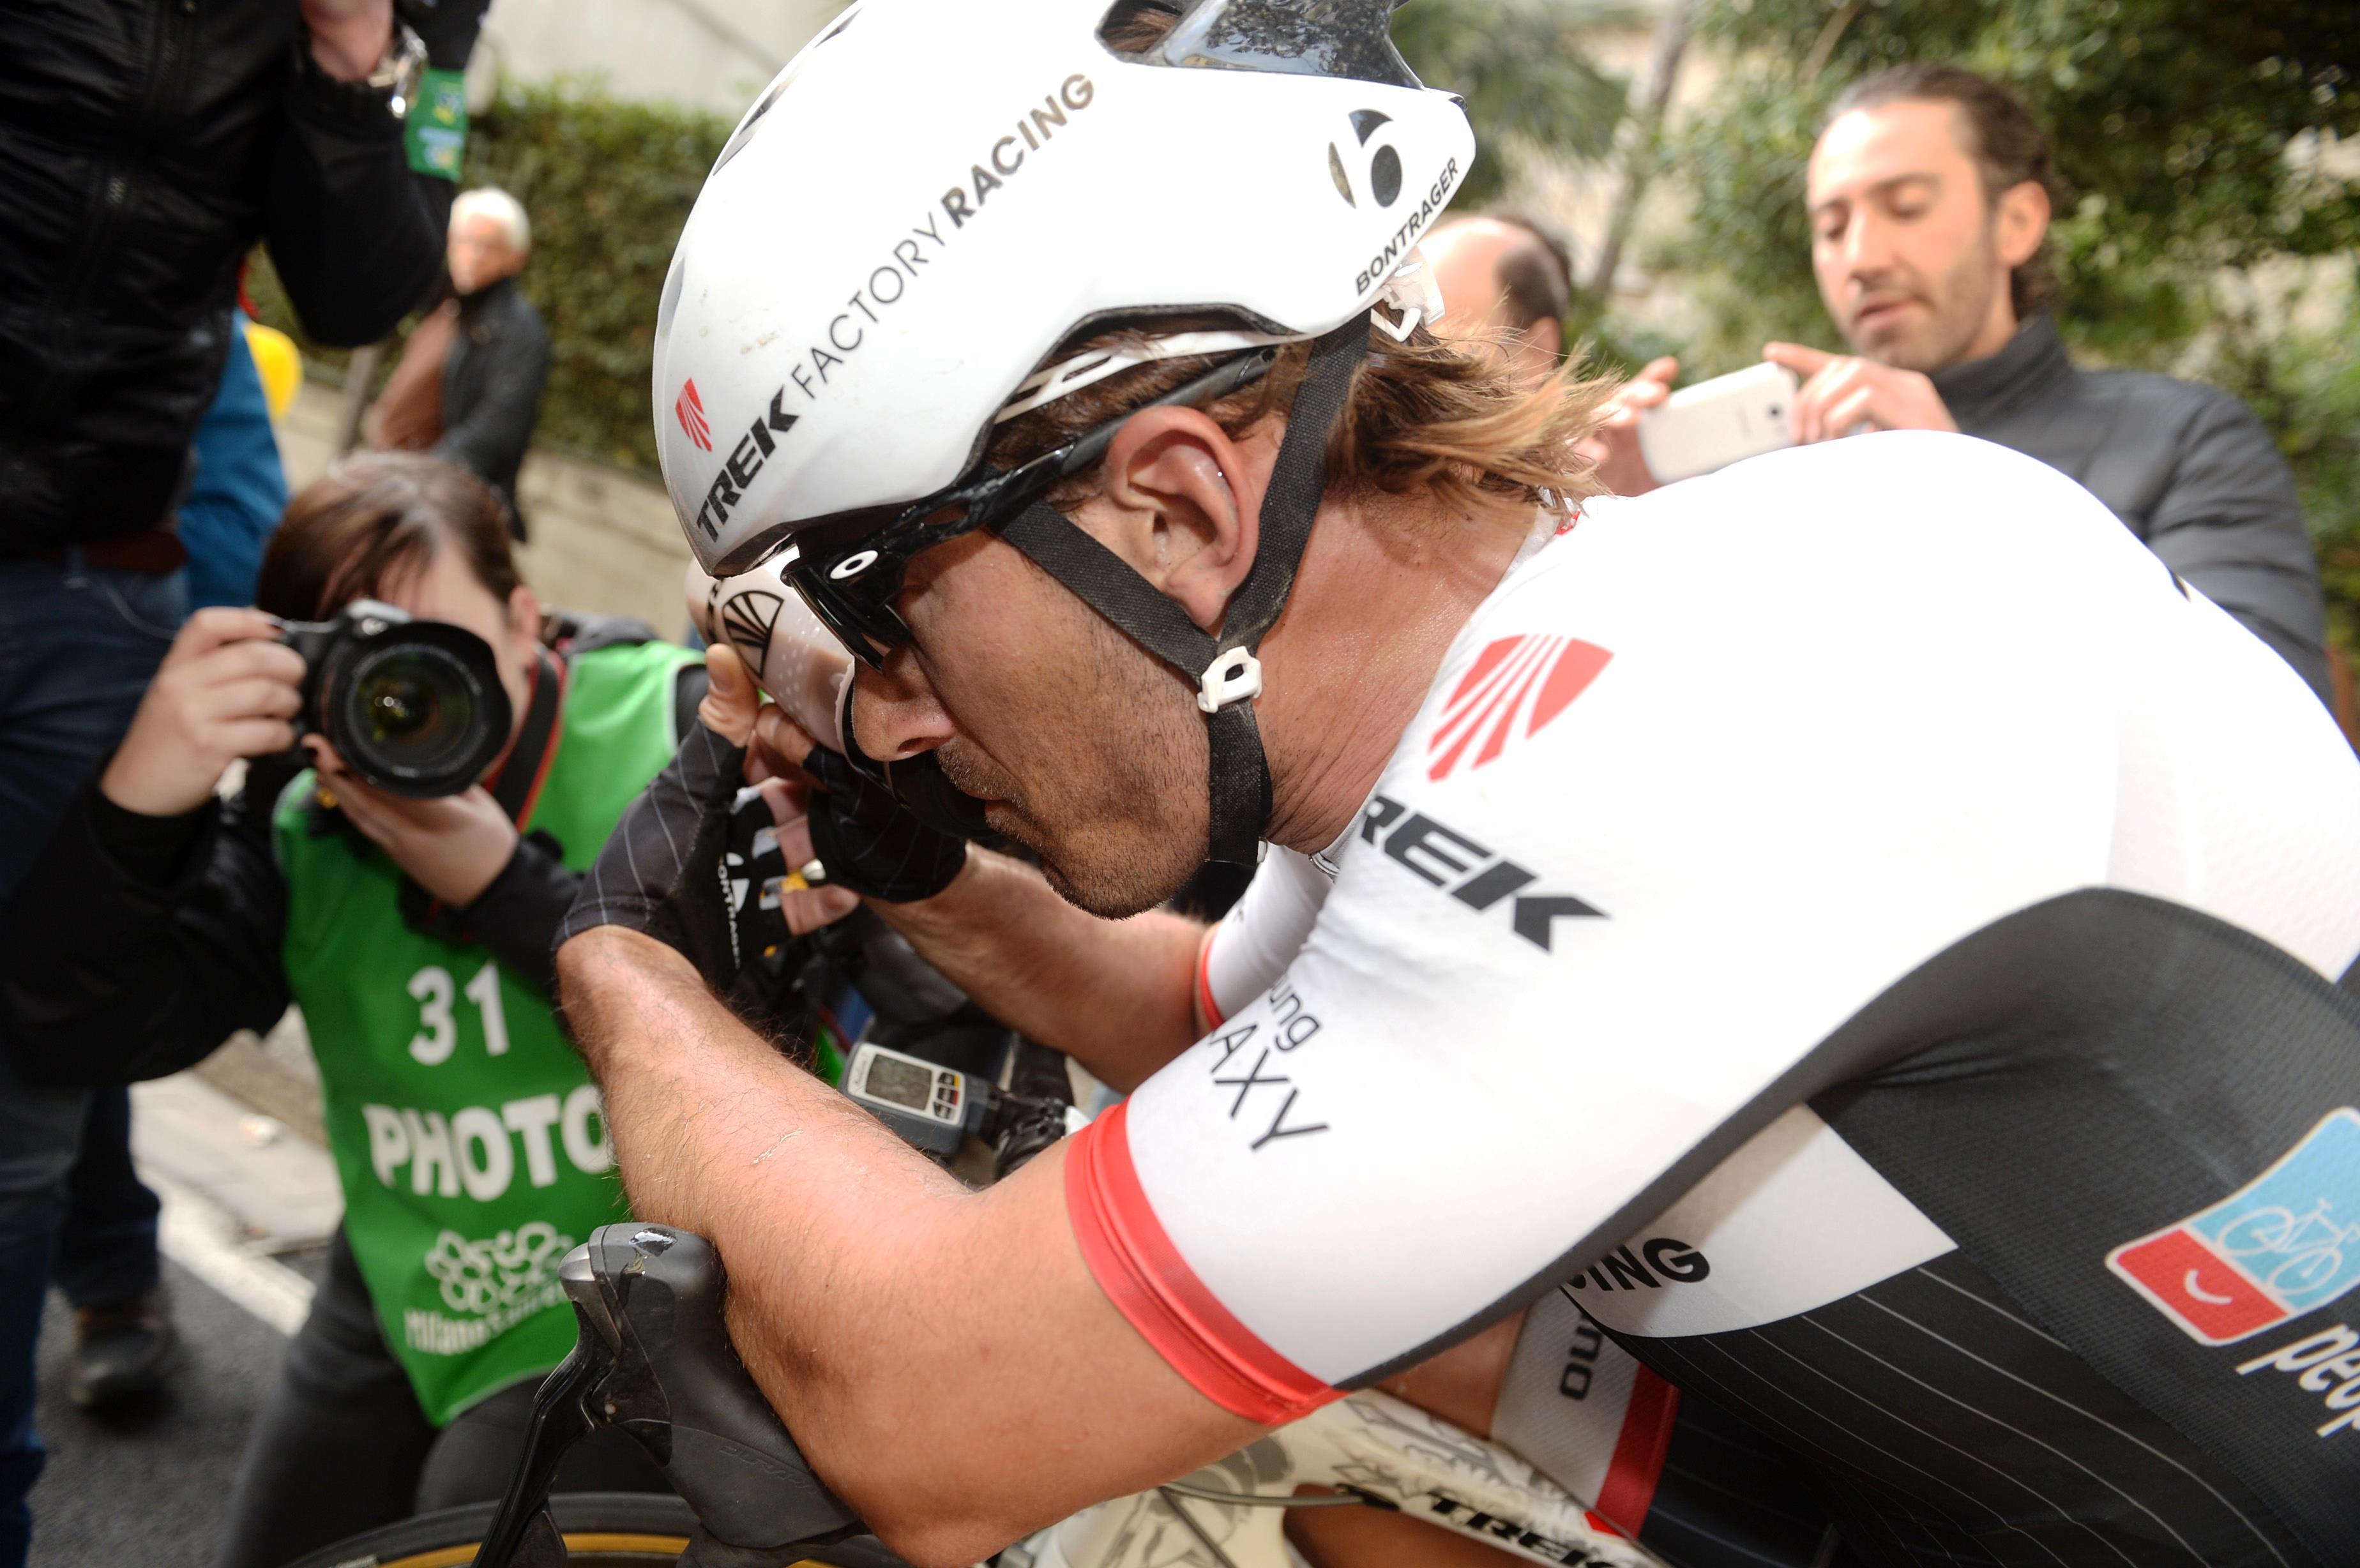 Fabian Cancellara, Trek Factory Racing, Milan-San Remo, 2015, pic: Sirotti